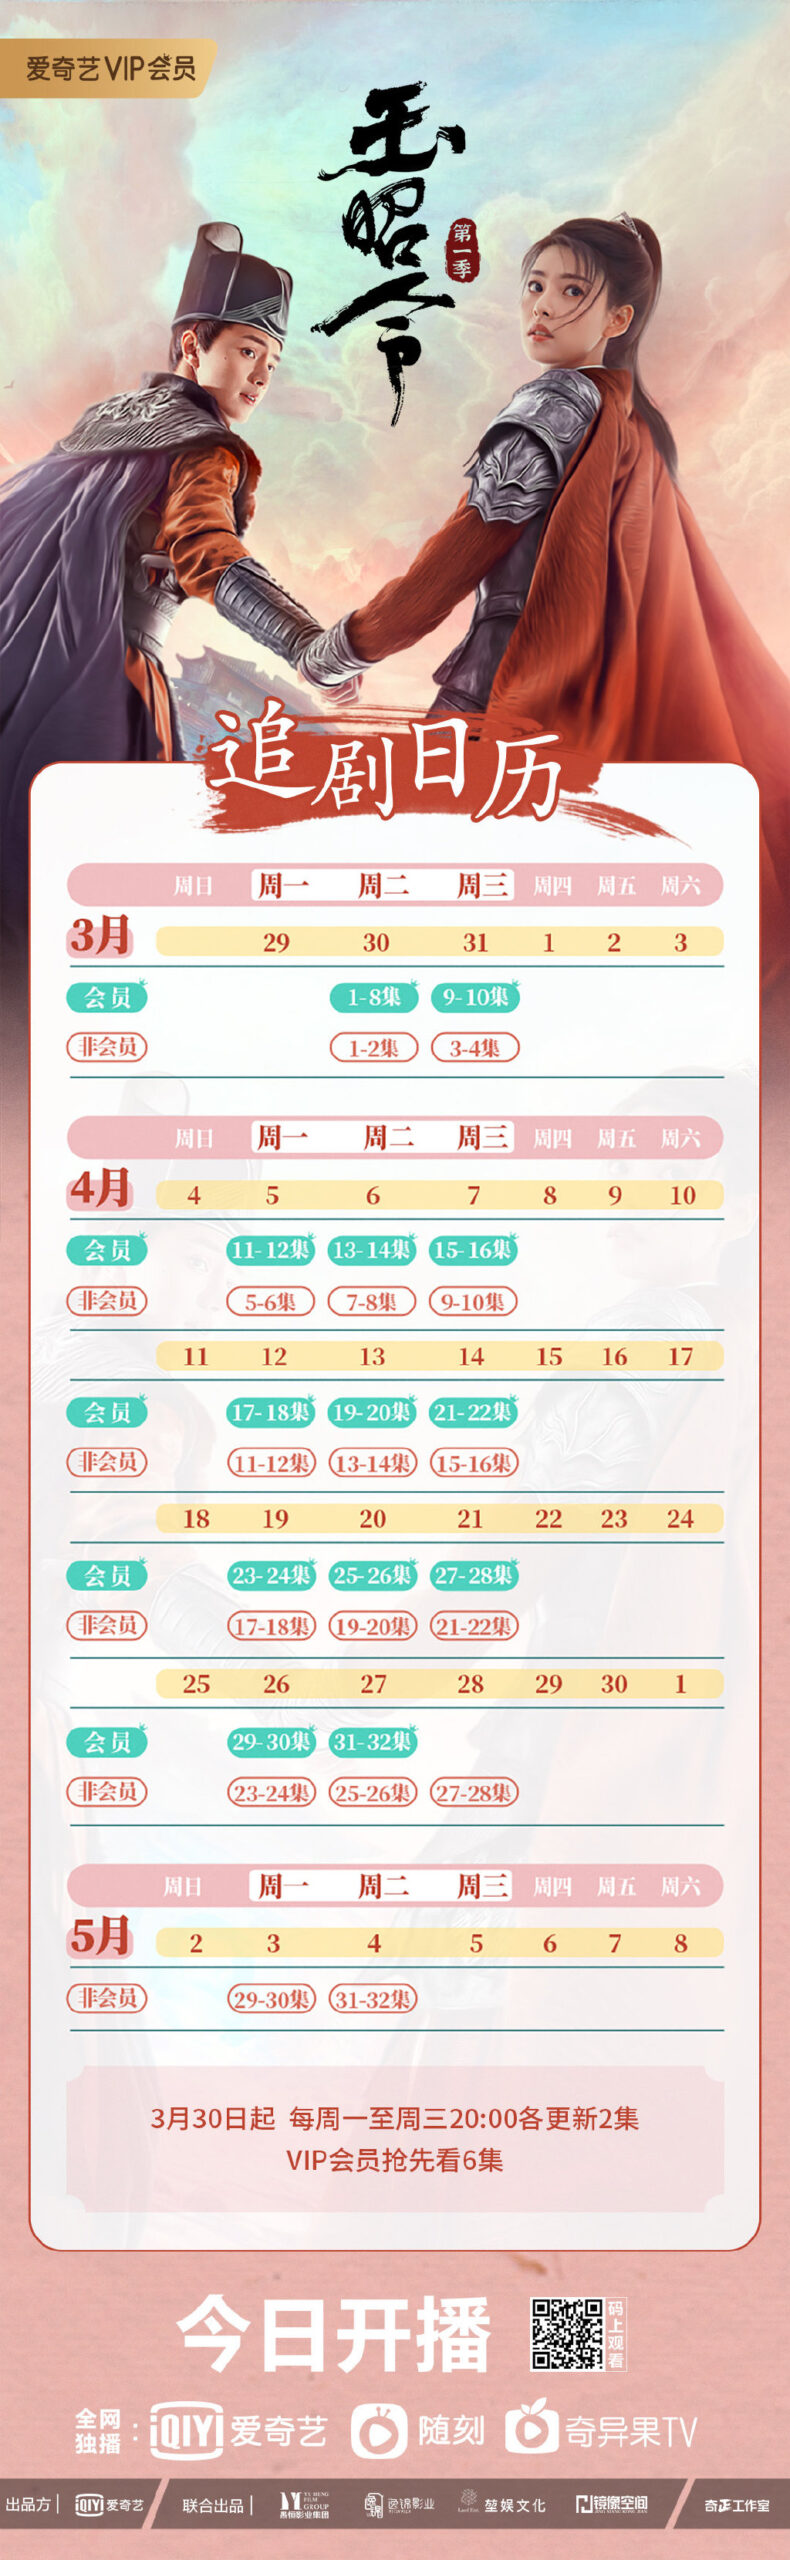 No Boundary Chinese Drama Airing Calendar